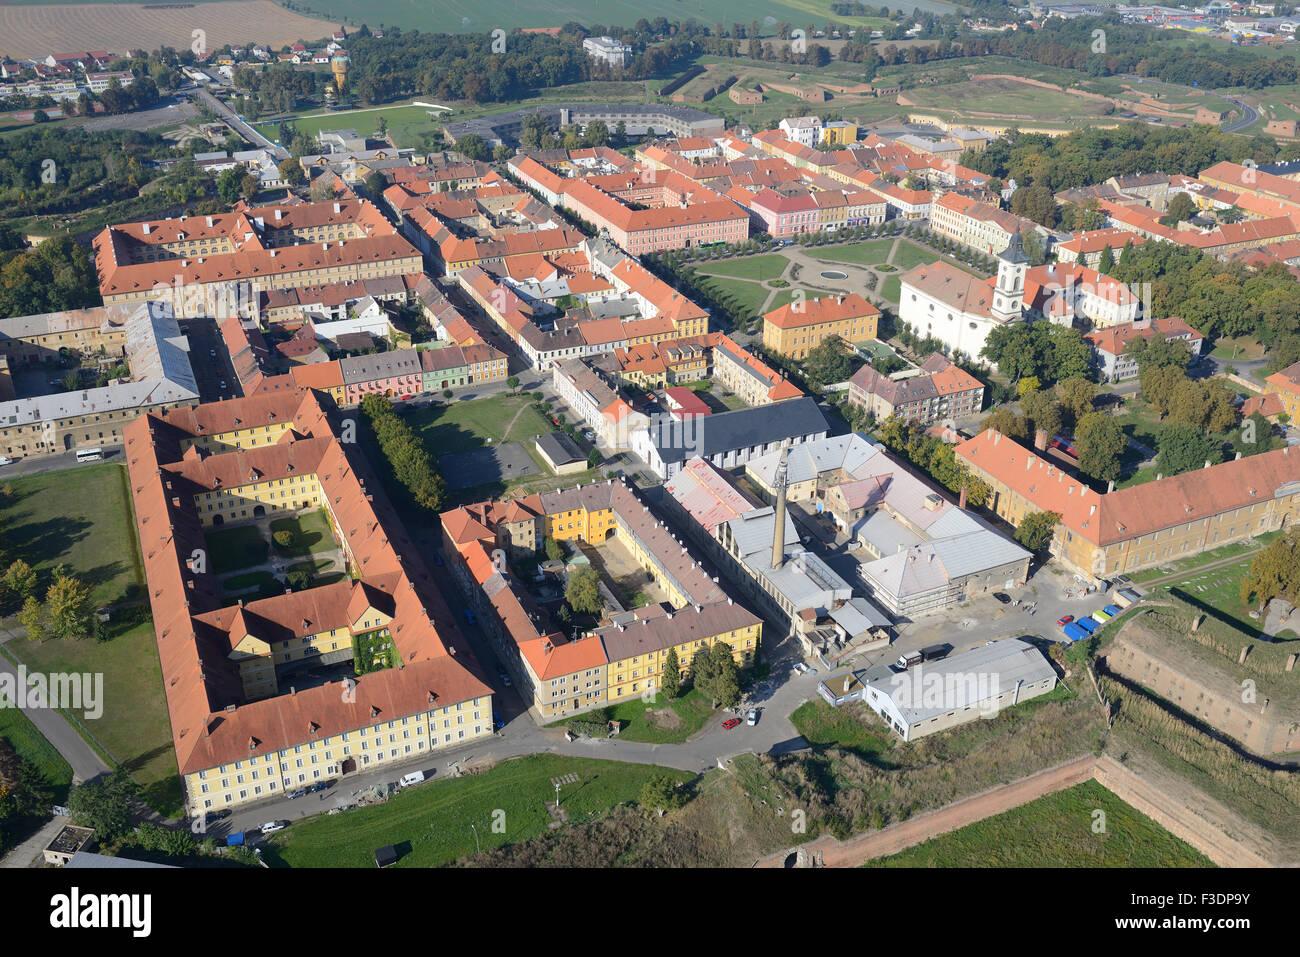 Theresienstadt Stock Photos & Theresienstadt Stock Images - Alamy